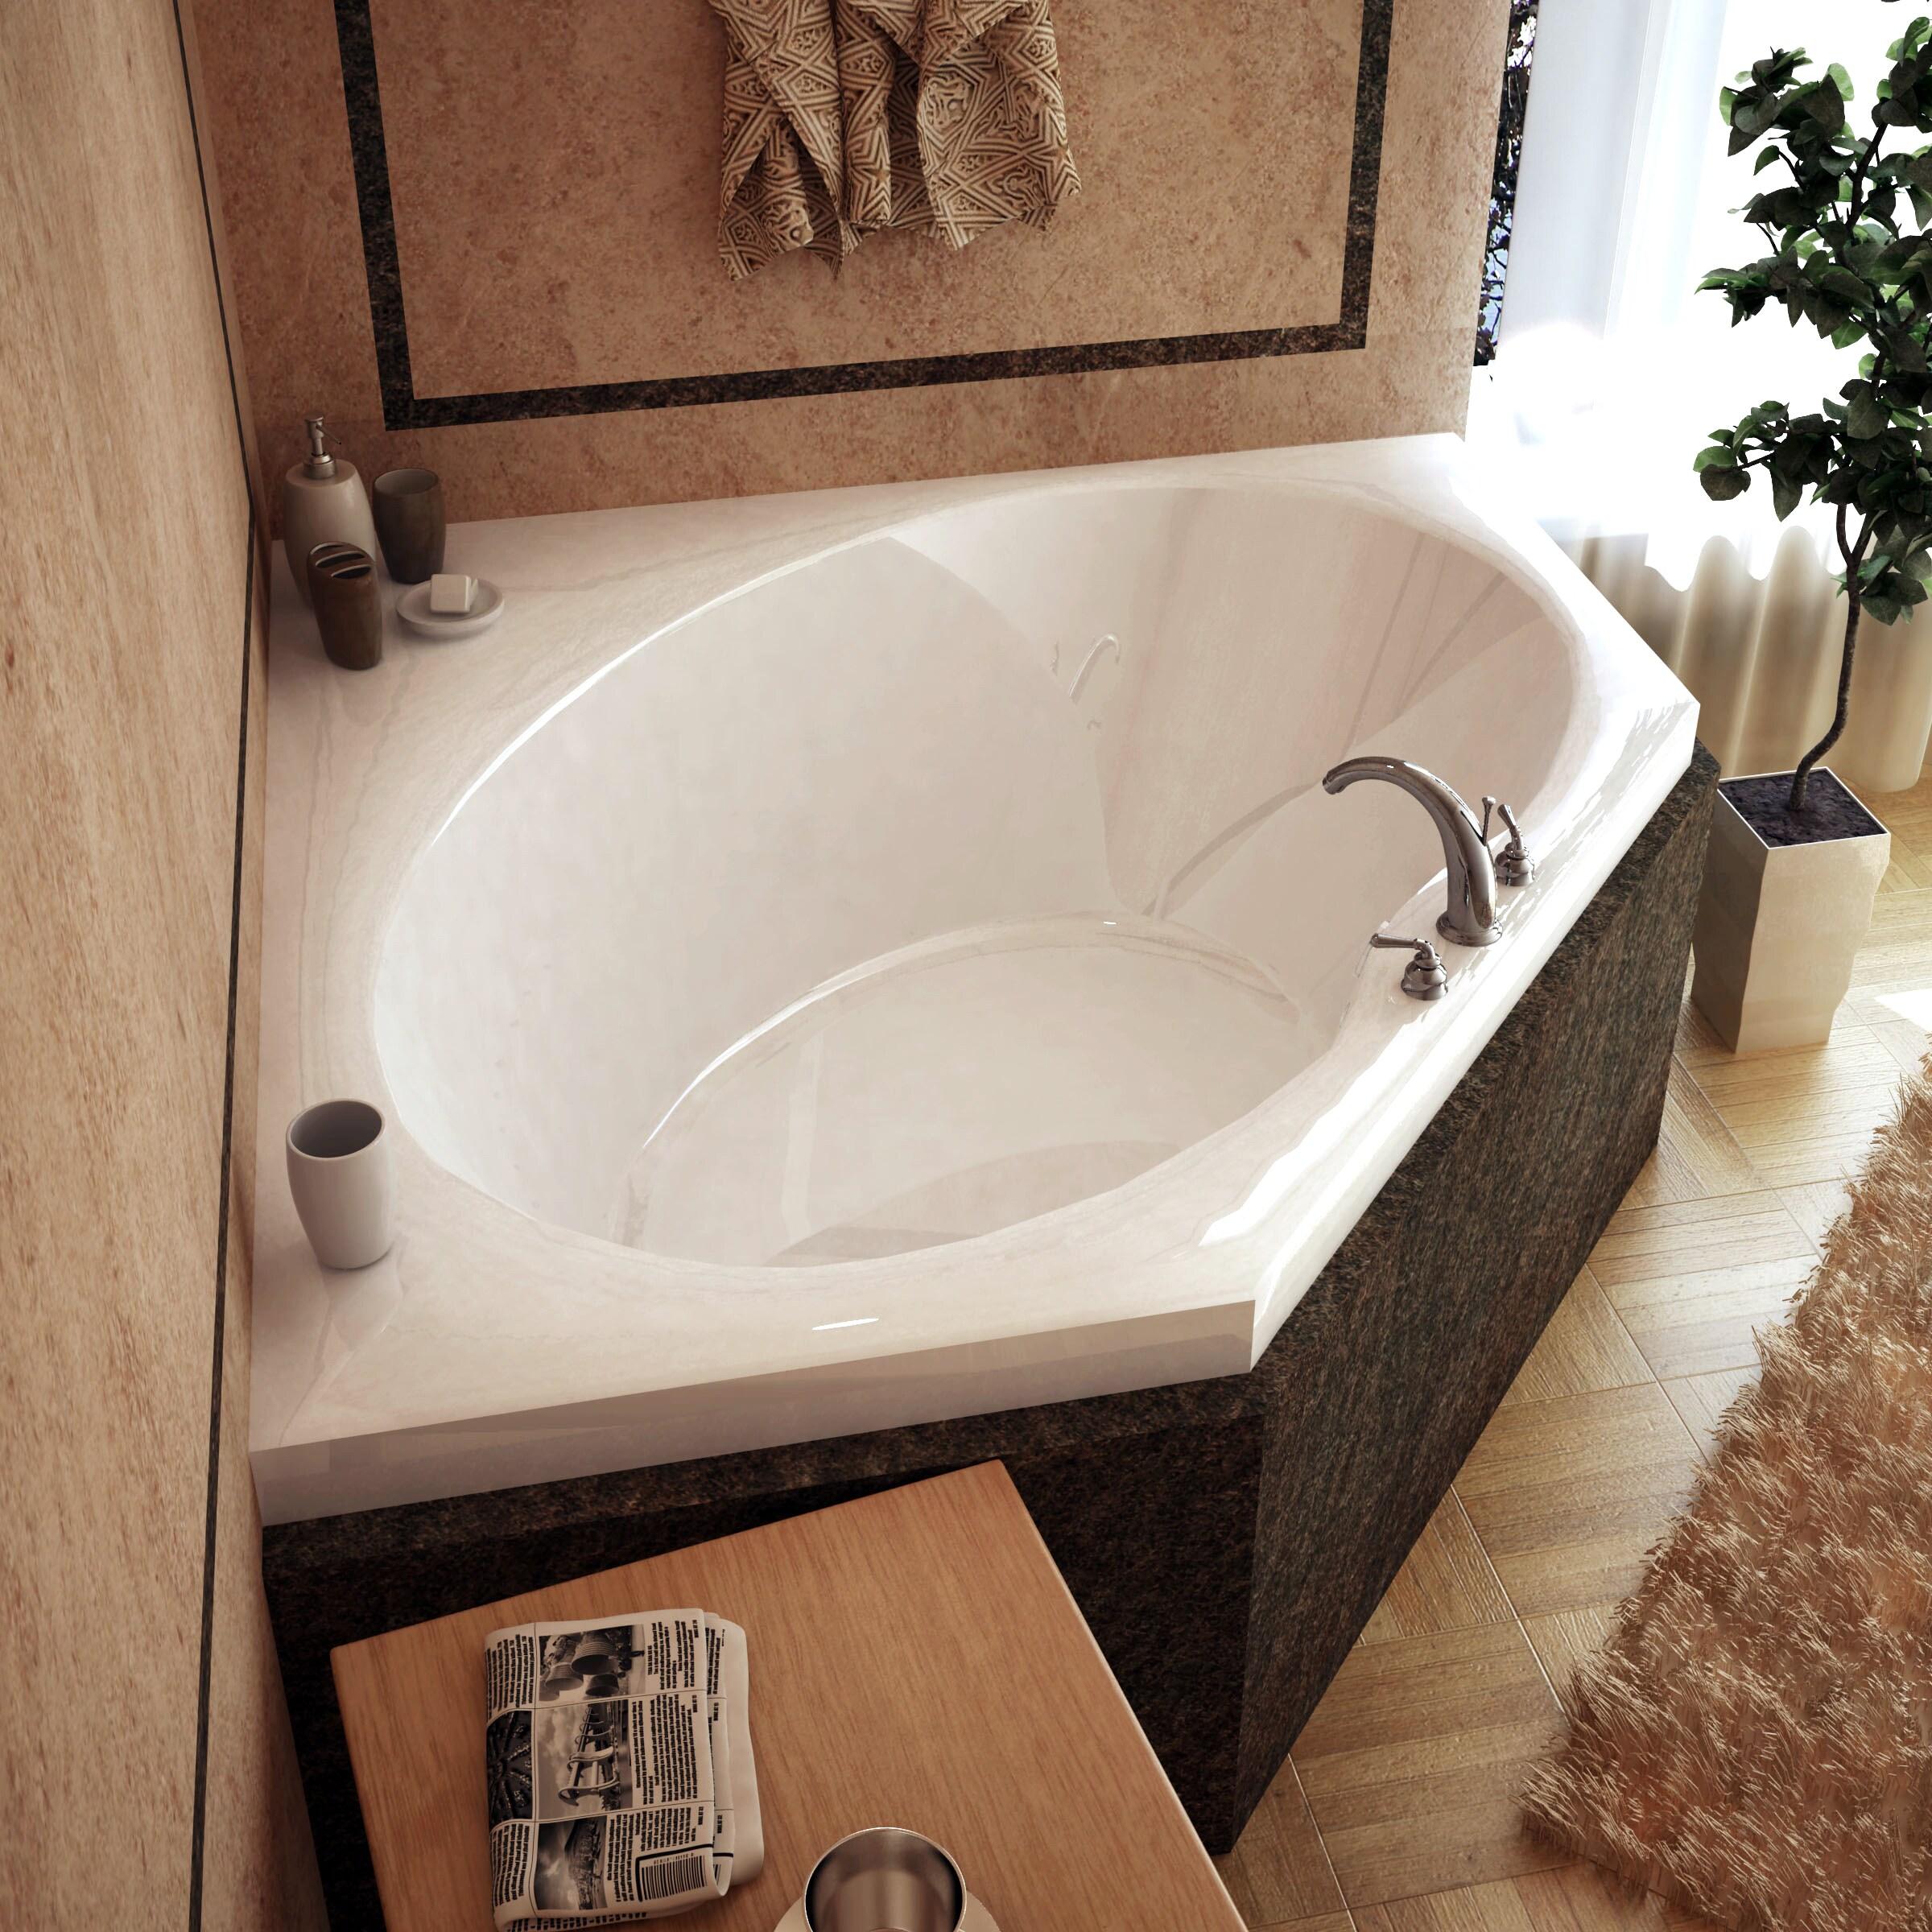 Atlantis Whirlpools Venus 60 x 60 Corner Soaking Bathtub in White ...